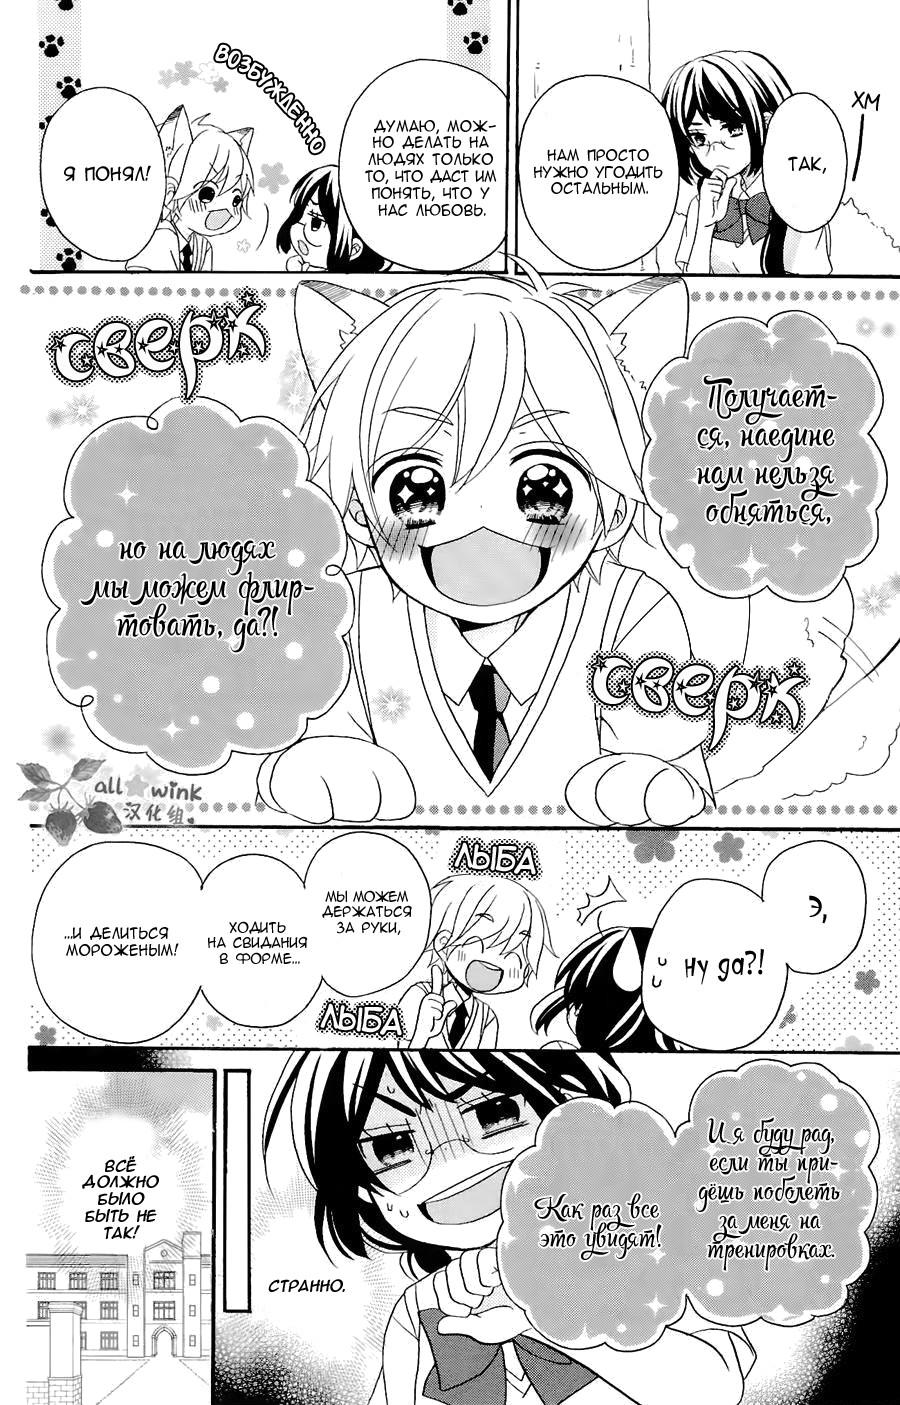 https://r1.ninemanga.com/comics/pic2/10/27402/322807/1492128781316.jpg Page 10